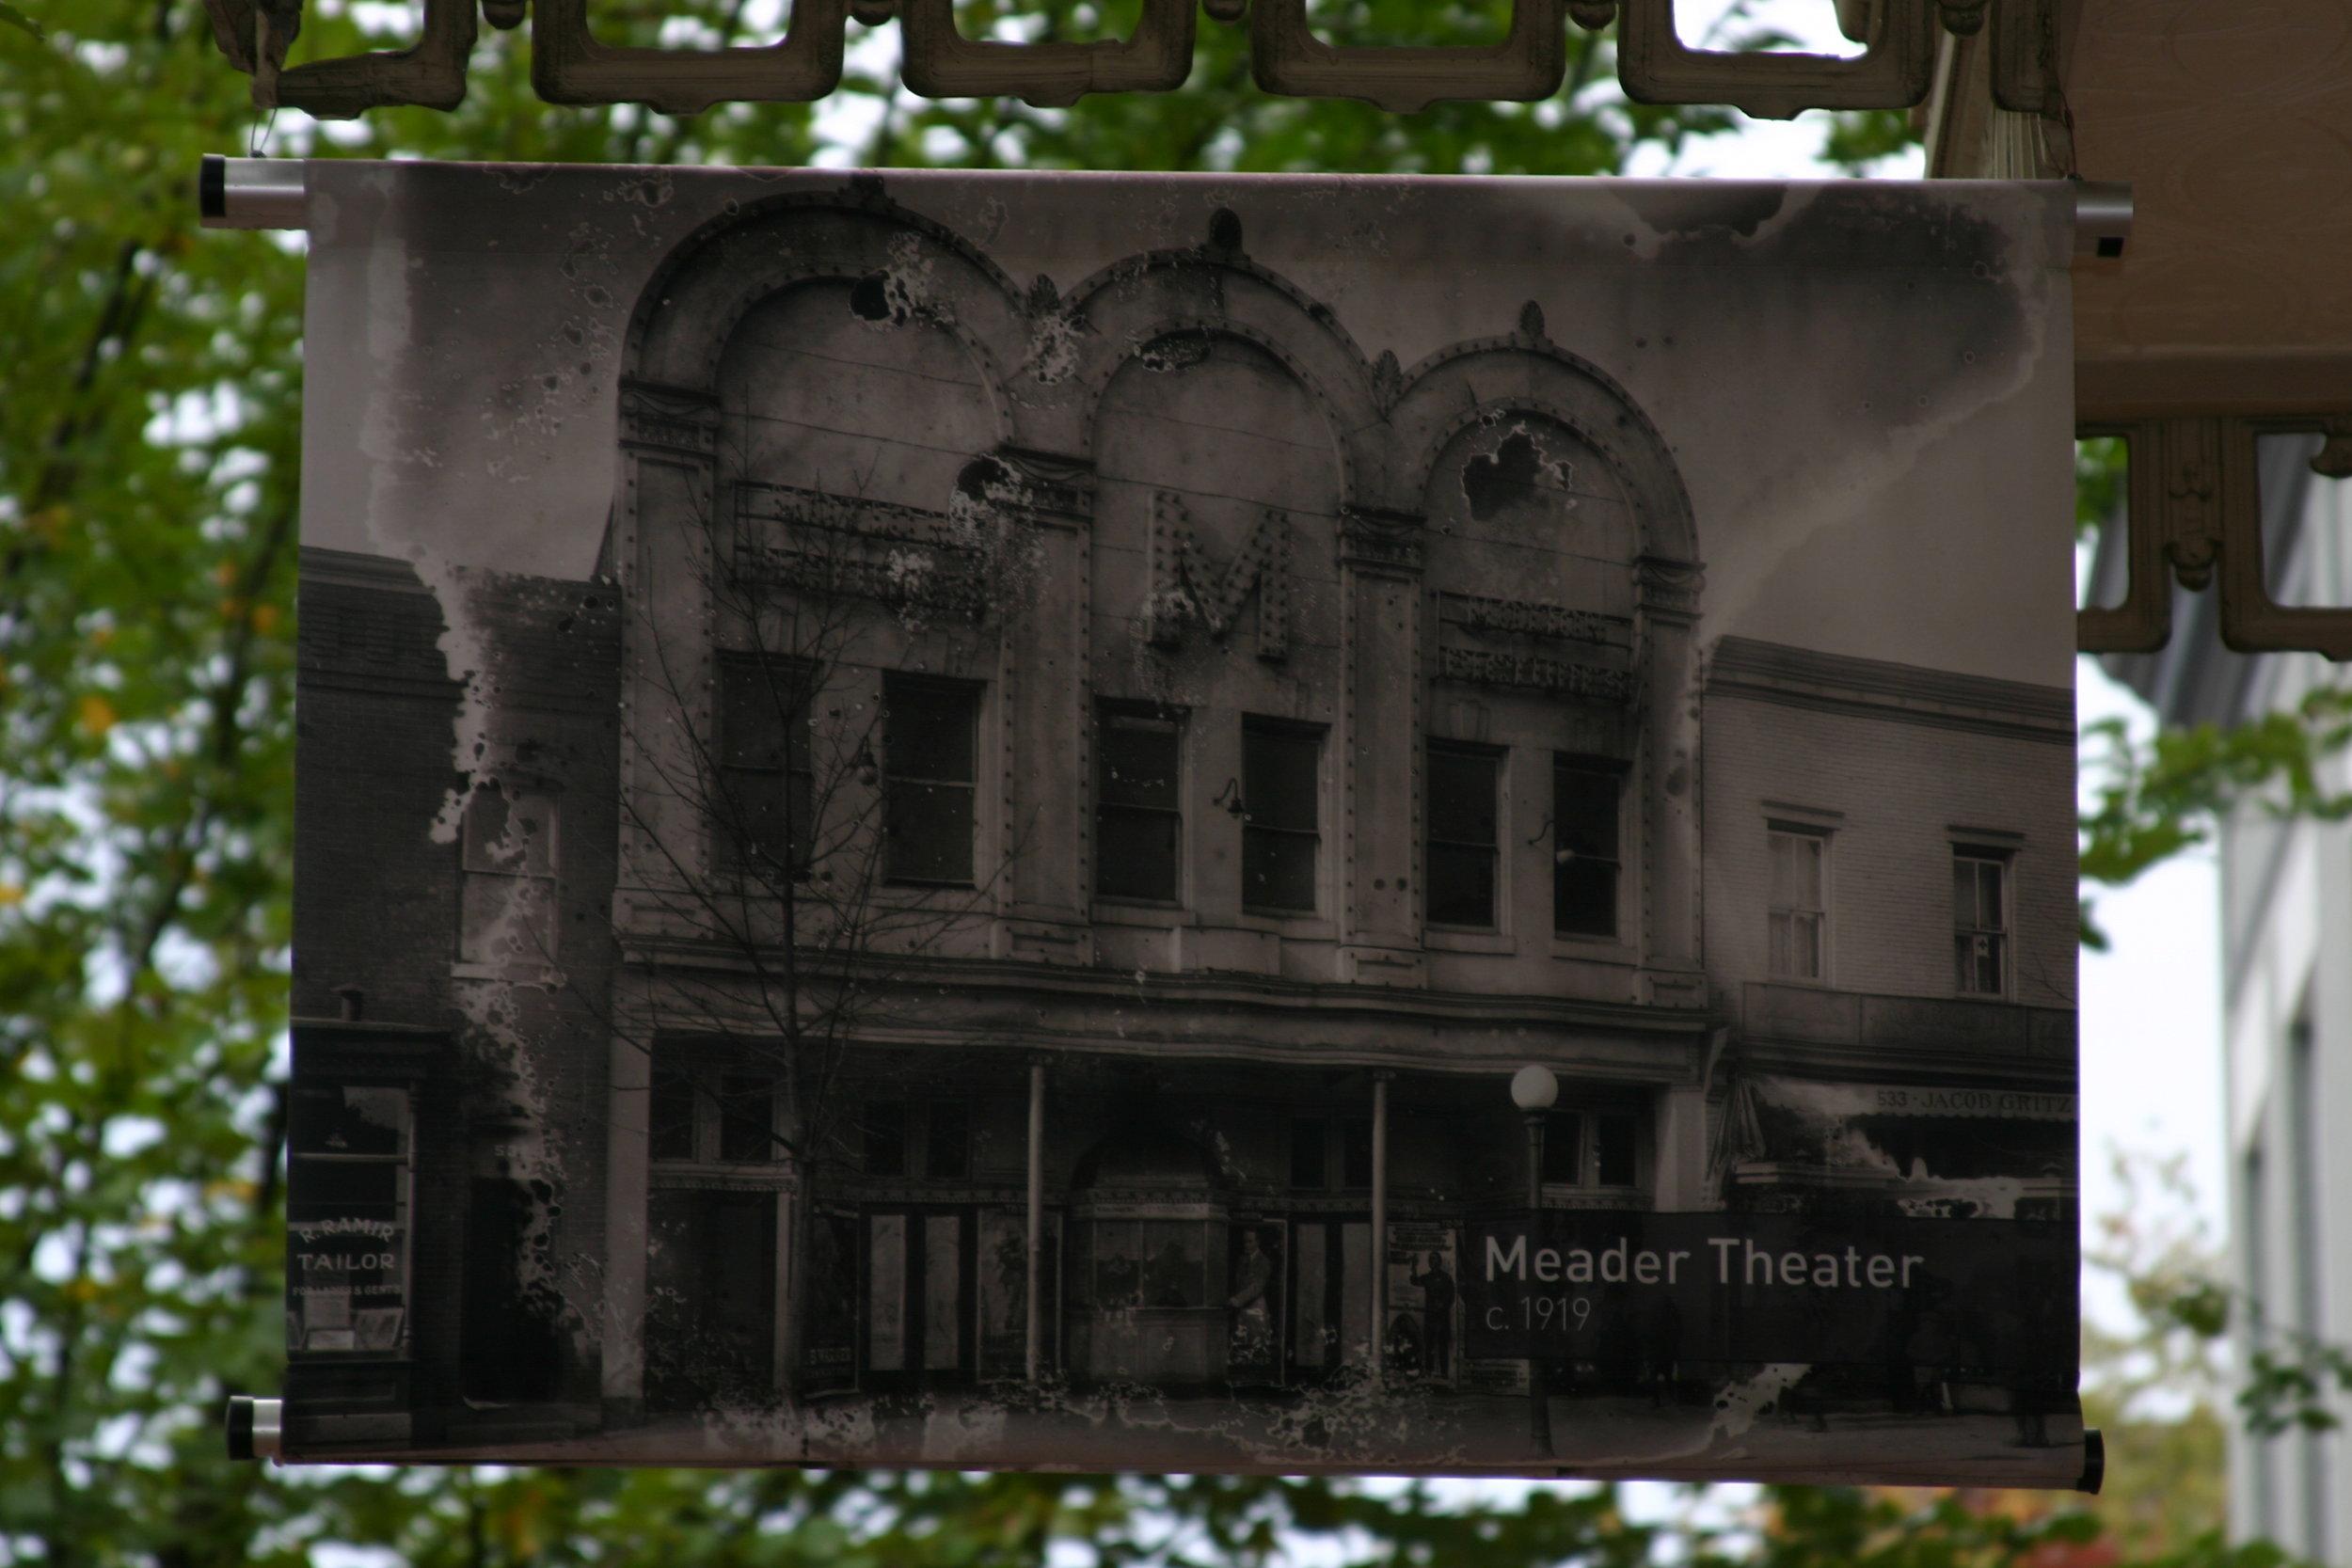 Meader Theater, Barracks Row, Washington, DC, Fall 2011